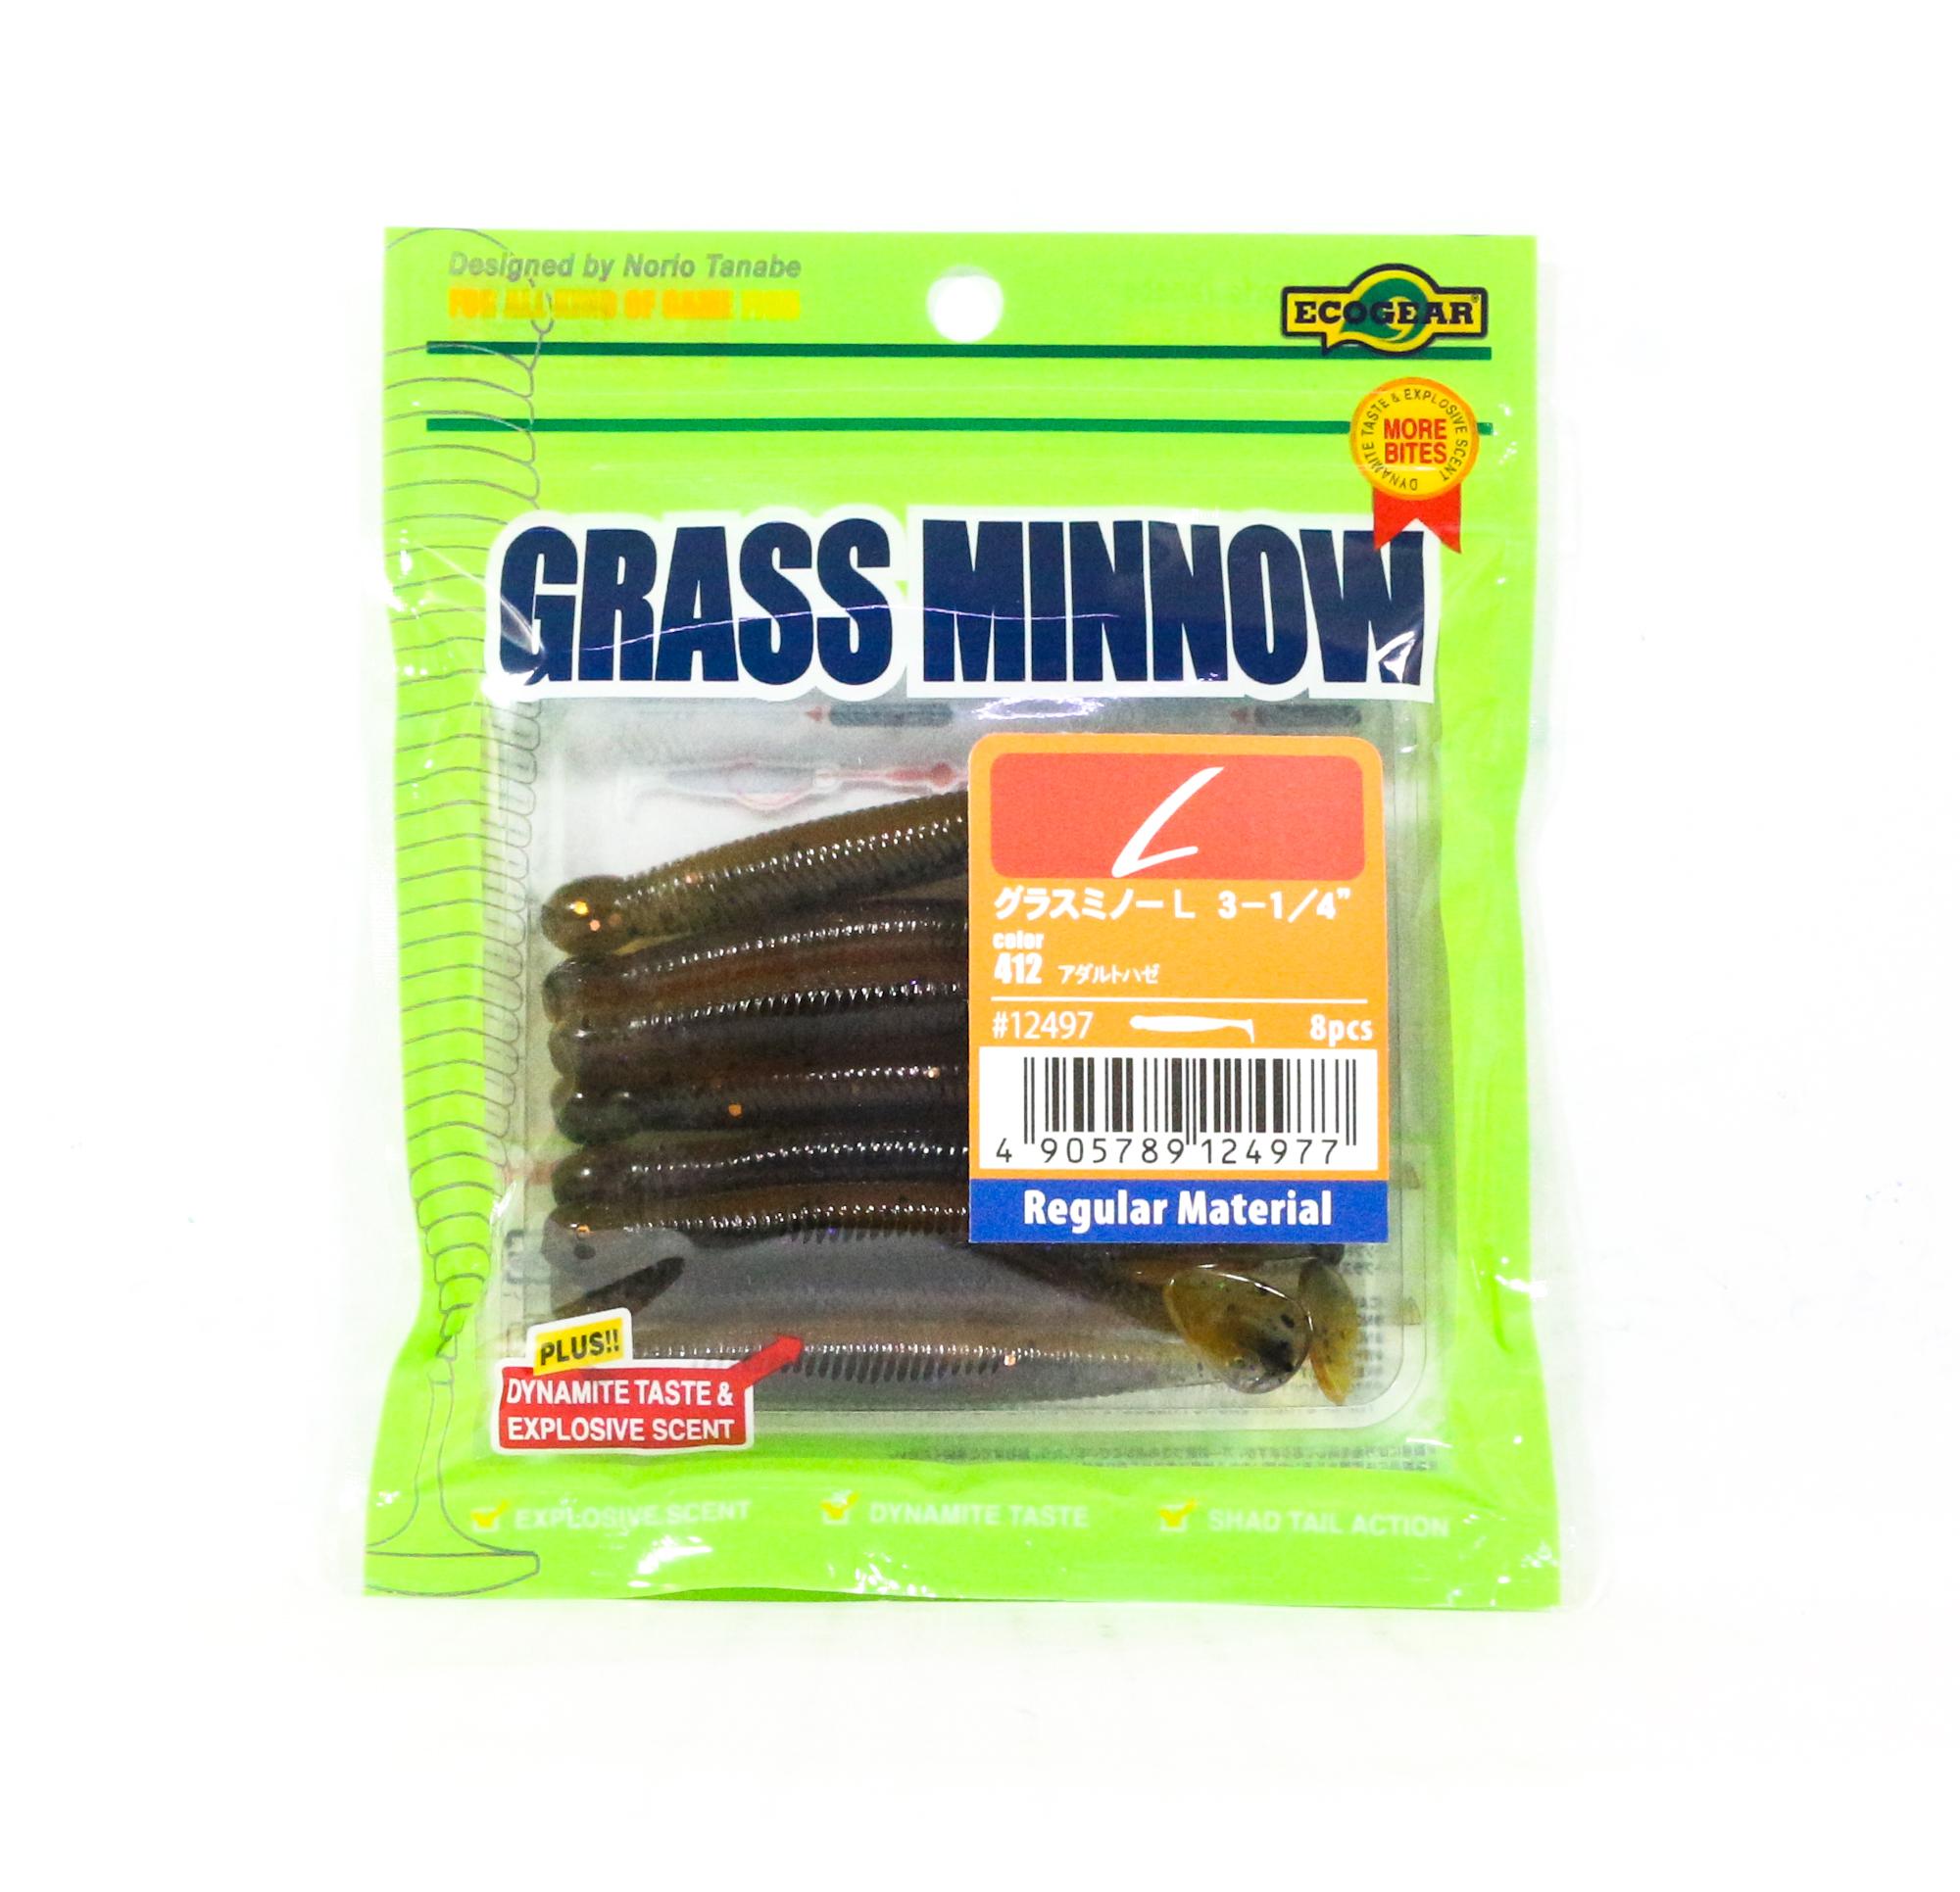 7636 Ecogear Soft Lure Grass Minnow L 3-1//4 Inch 8 piece per pack 010